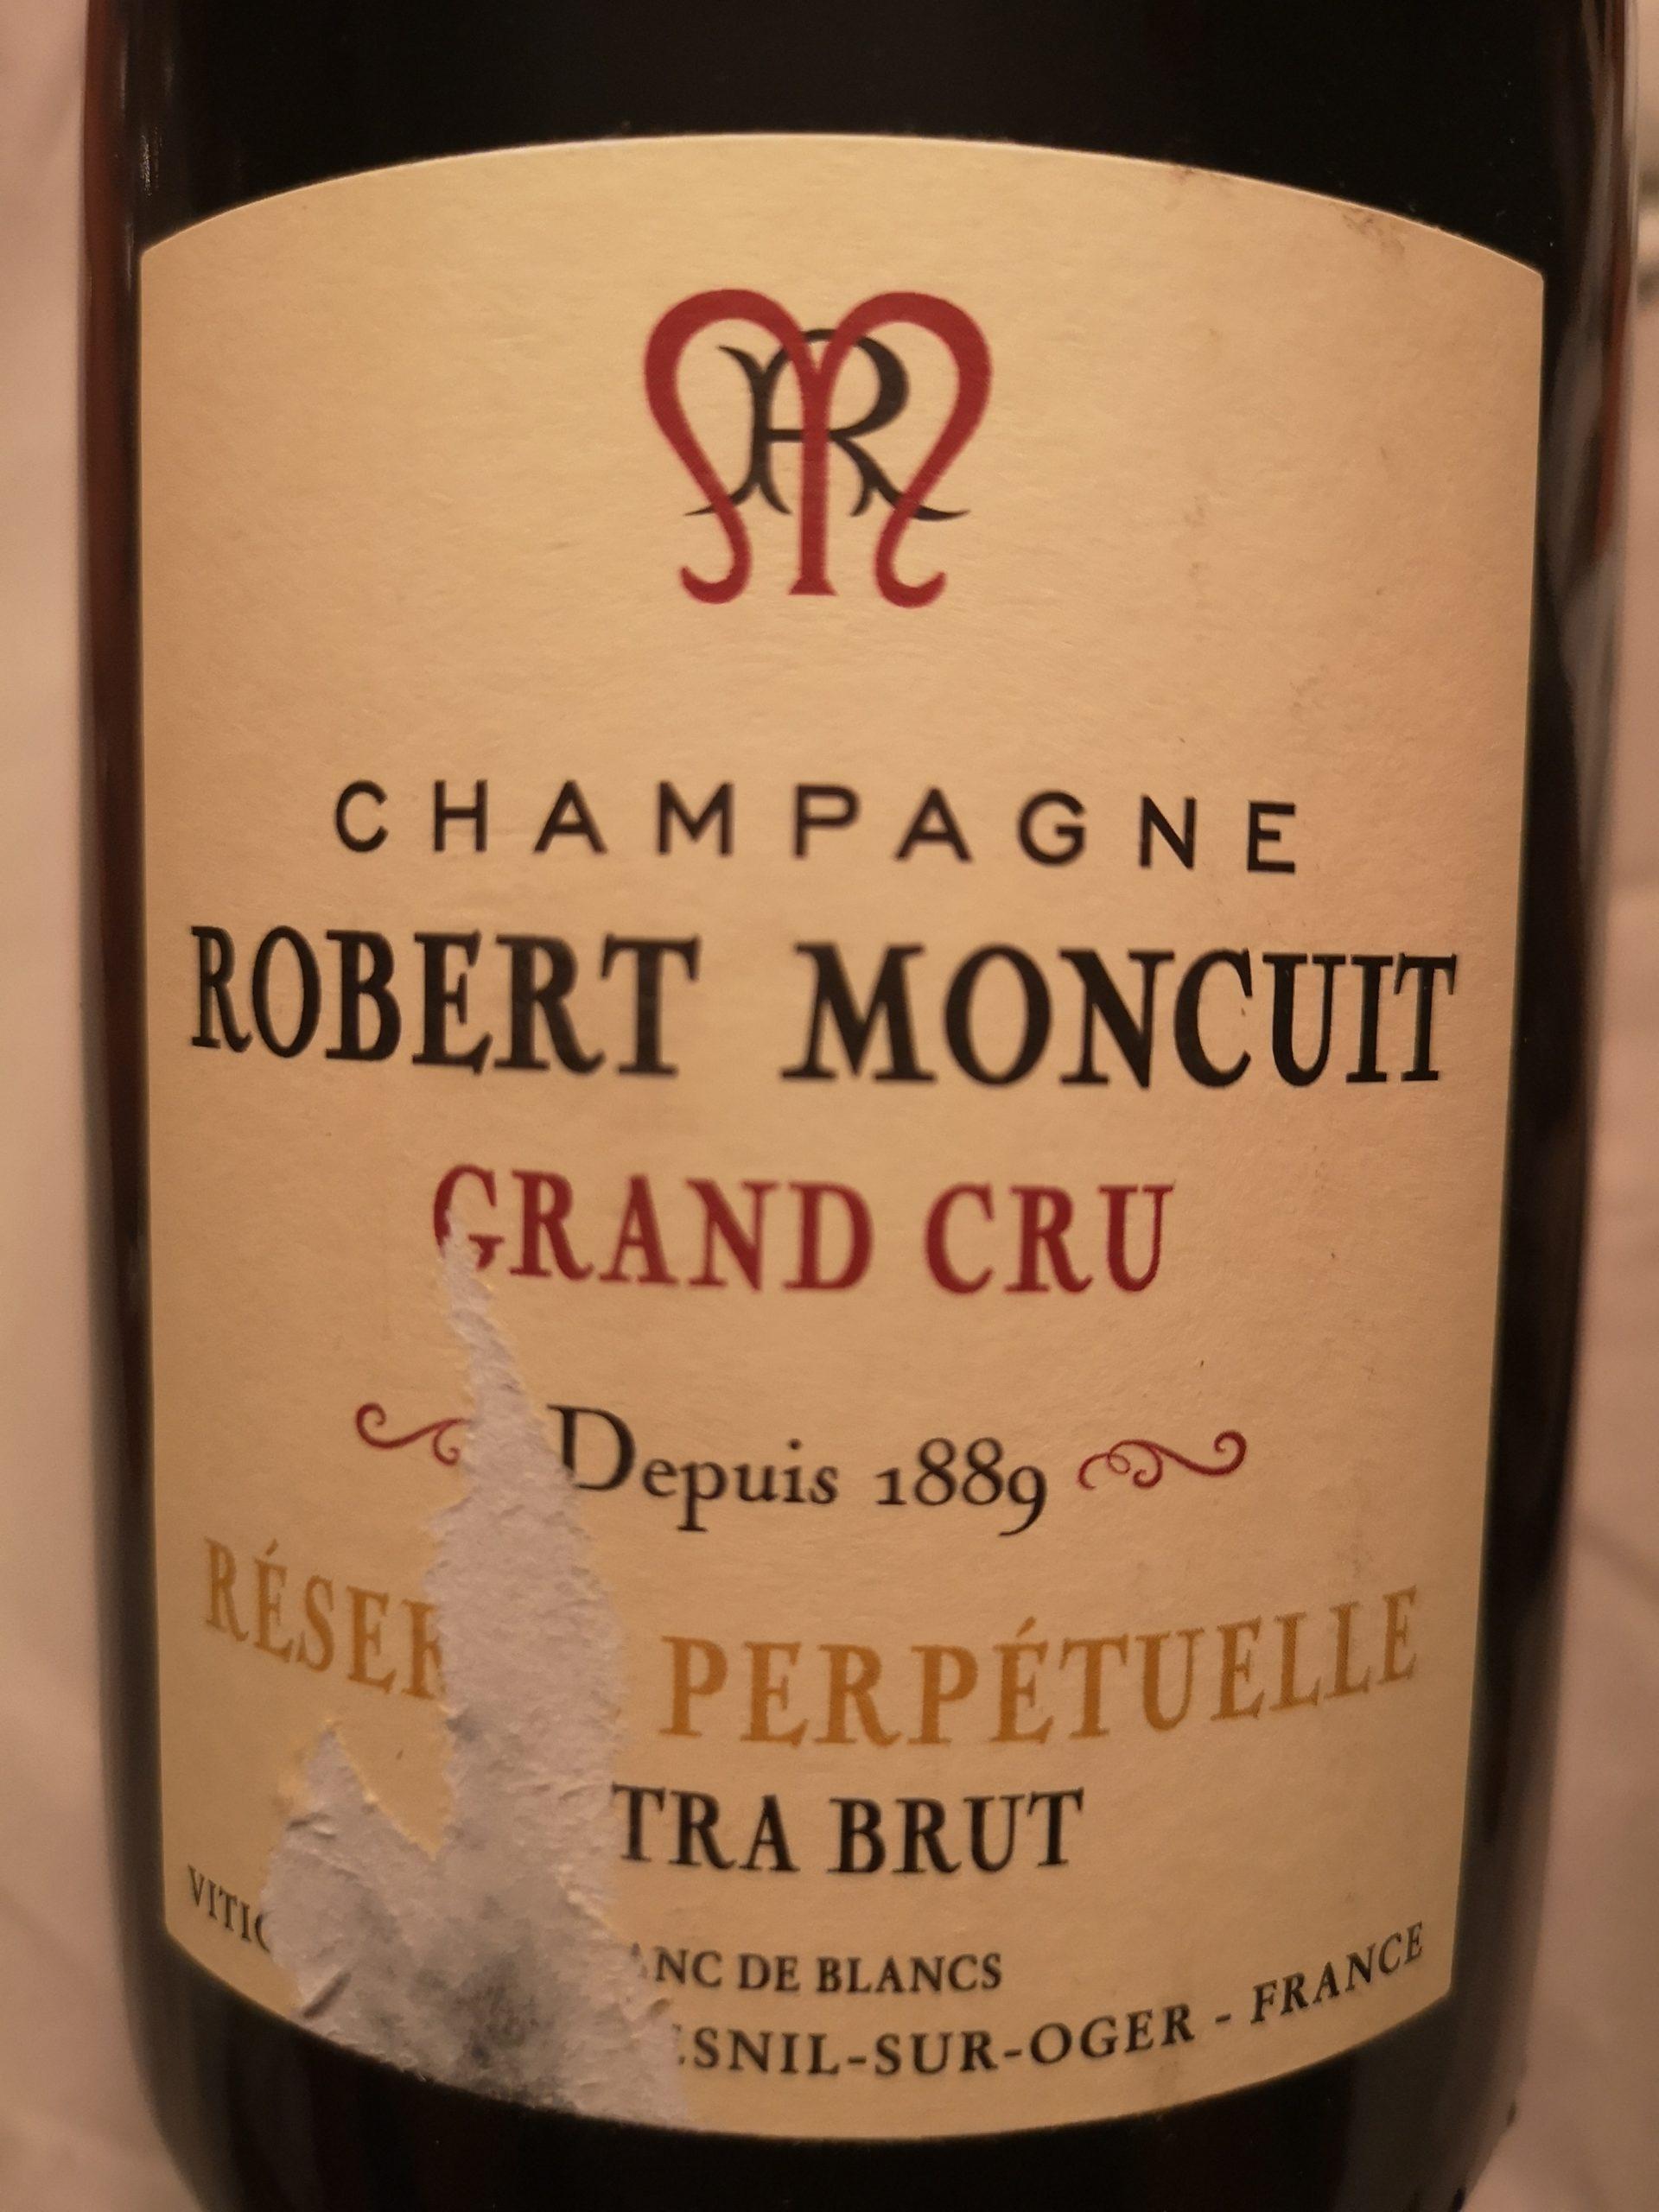 -nv- Champagne Extra Brut Grand Cru Blanc de Blancs Reserve Perpetuelle | Robert Moncuit